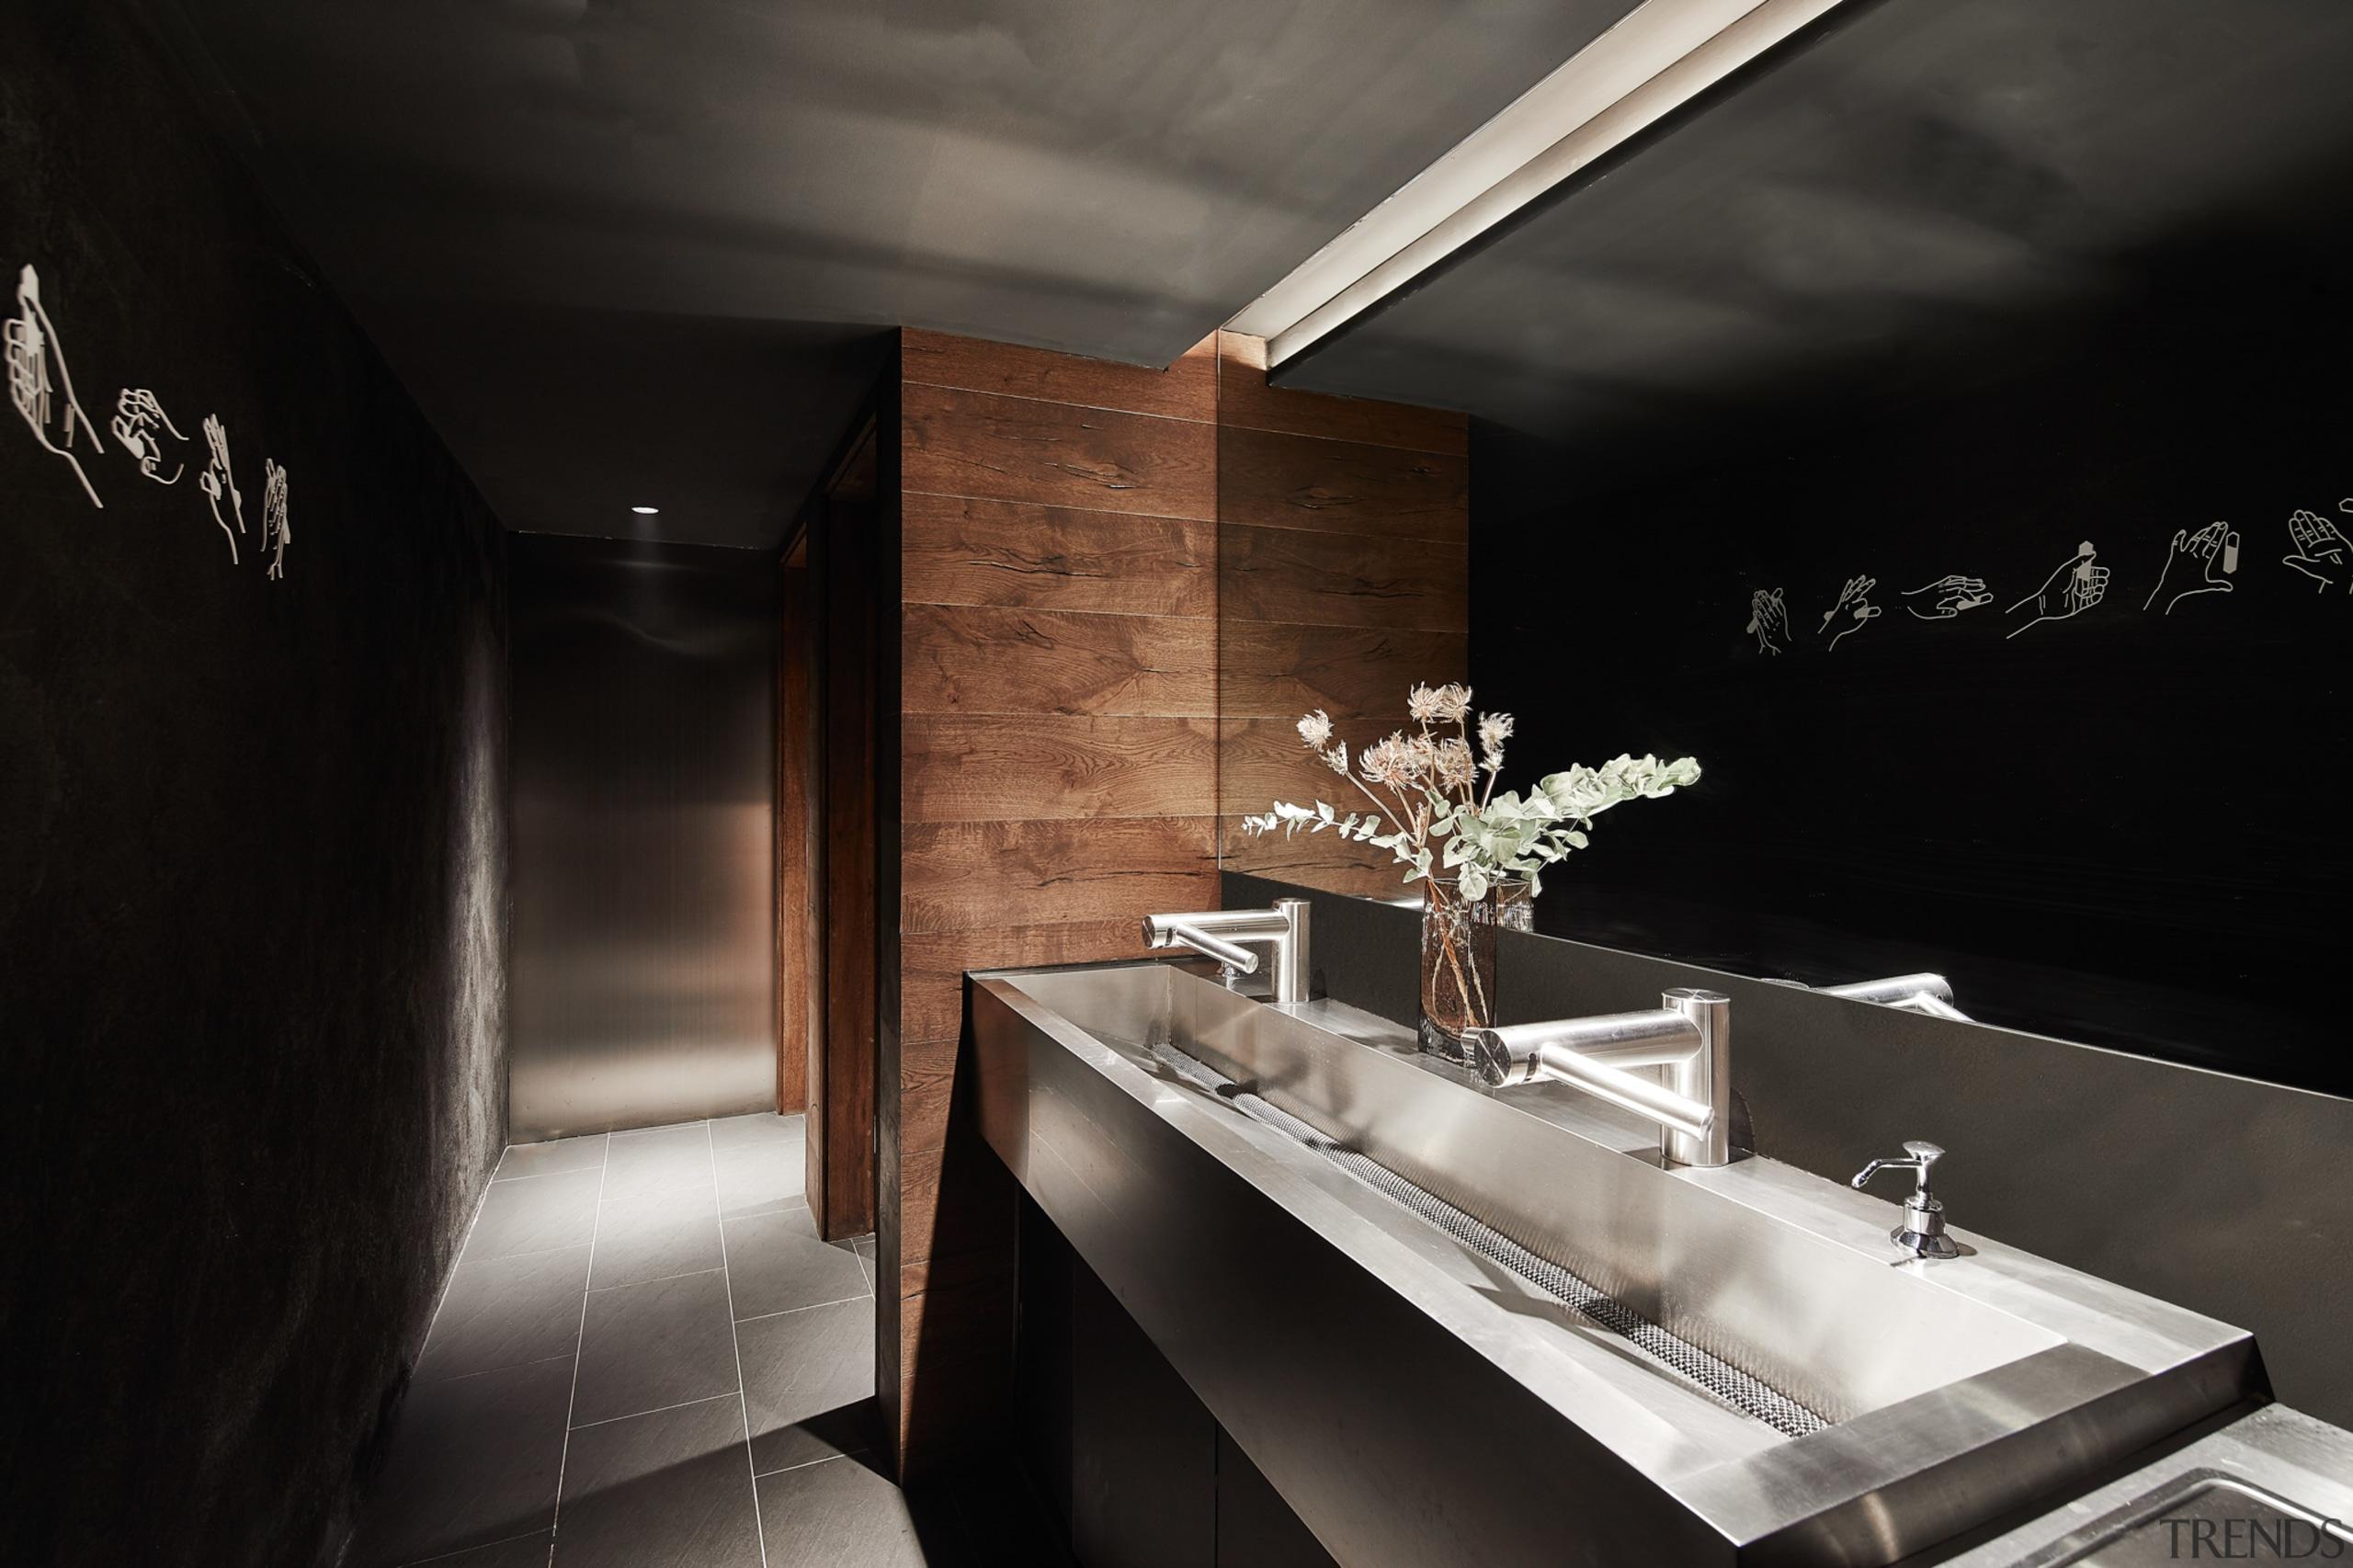 Even the bathrooms have a strong sculptural edge black